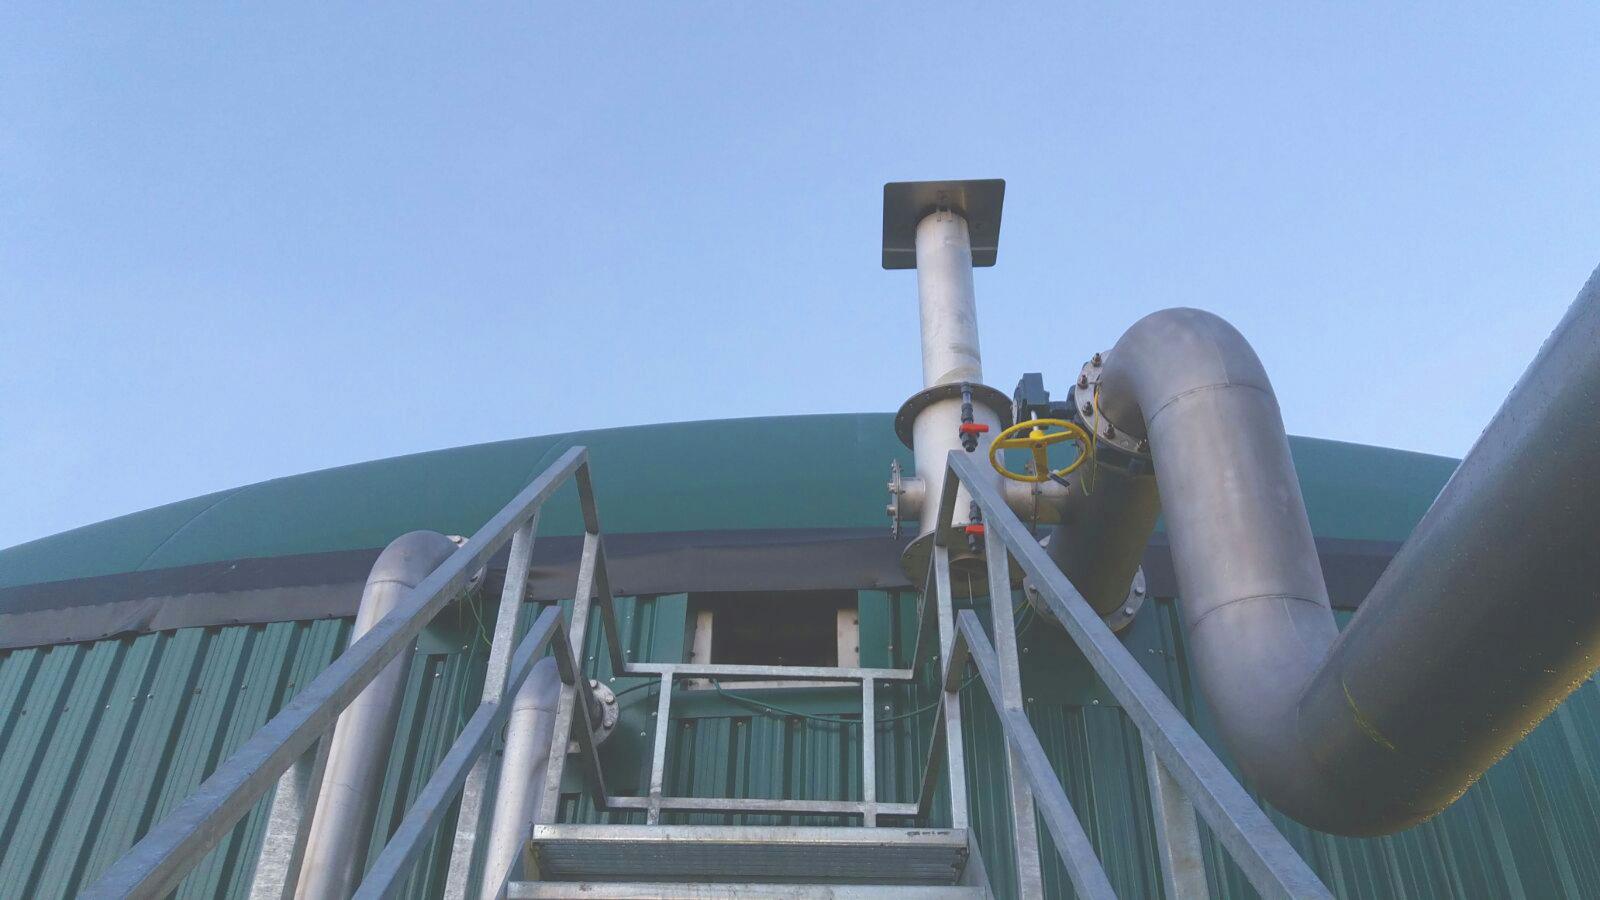 10 Válvulas de sobrepresión de gasómetros-Planta de Biogás de 1MW en Stracathro Reino Unido